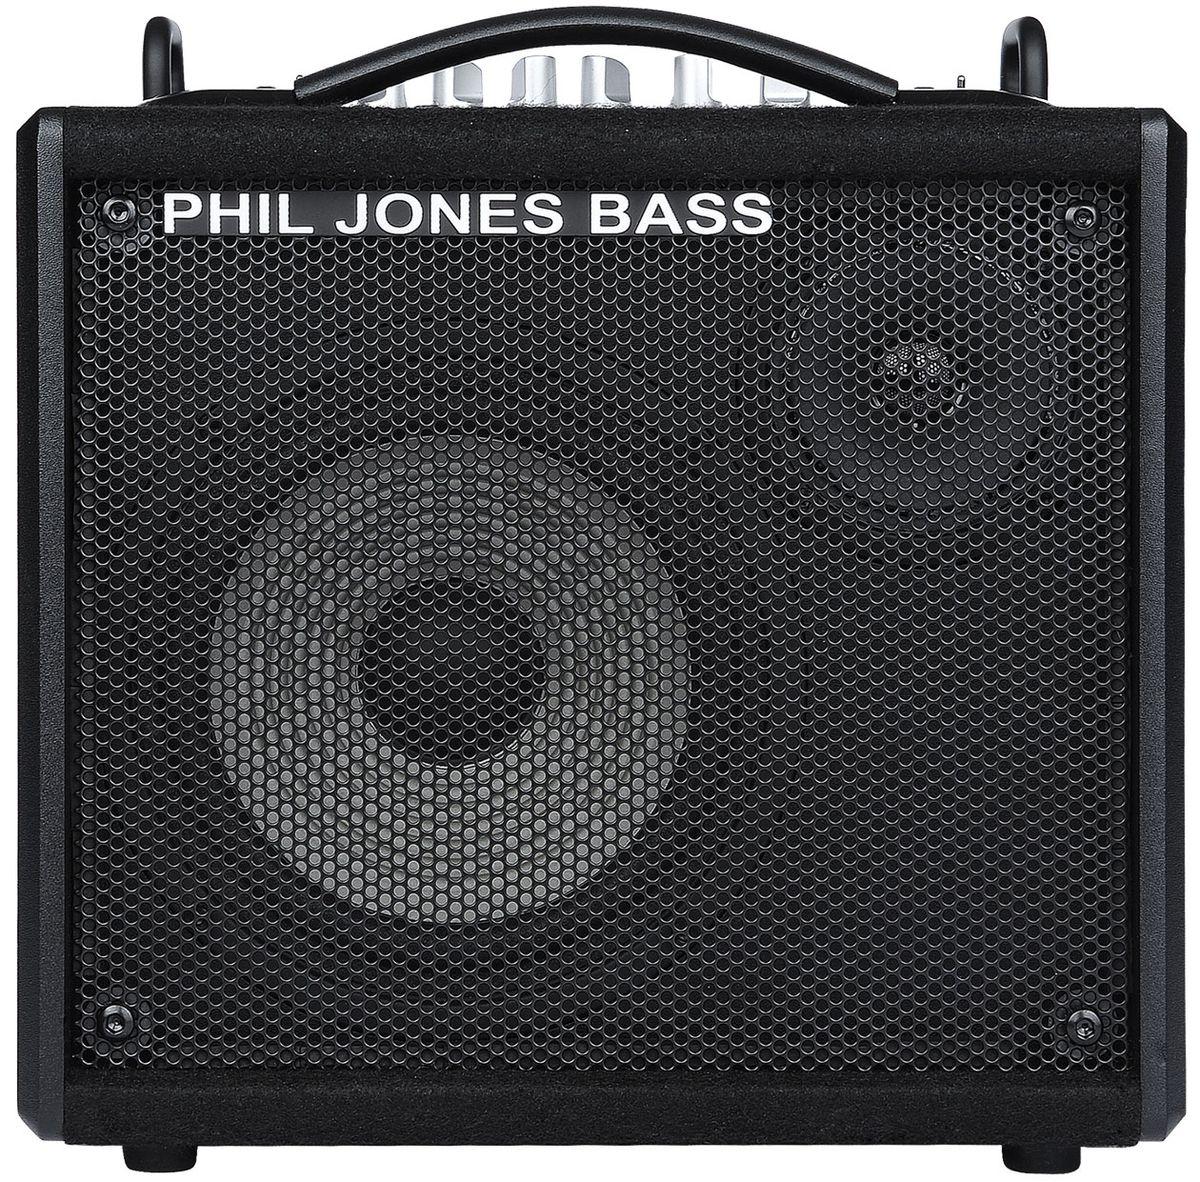 Quick Hit: Phil Jones Bass Micro 7 Review